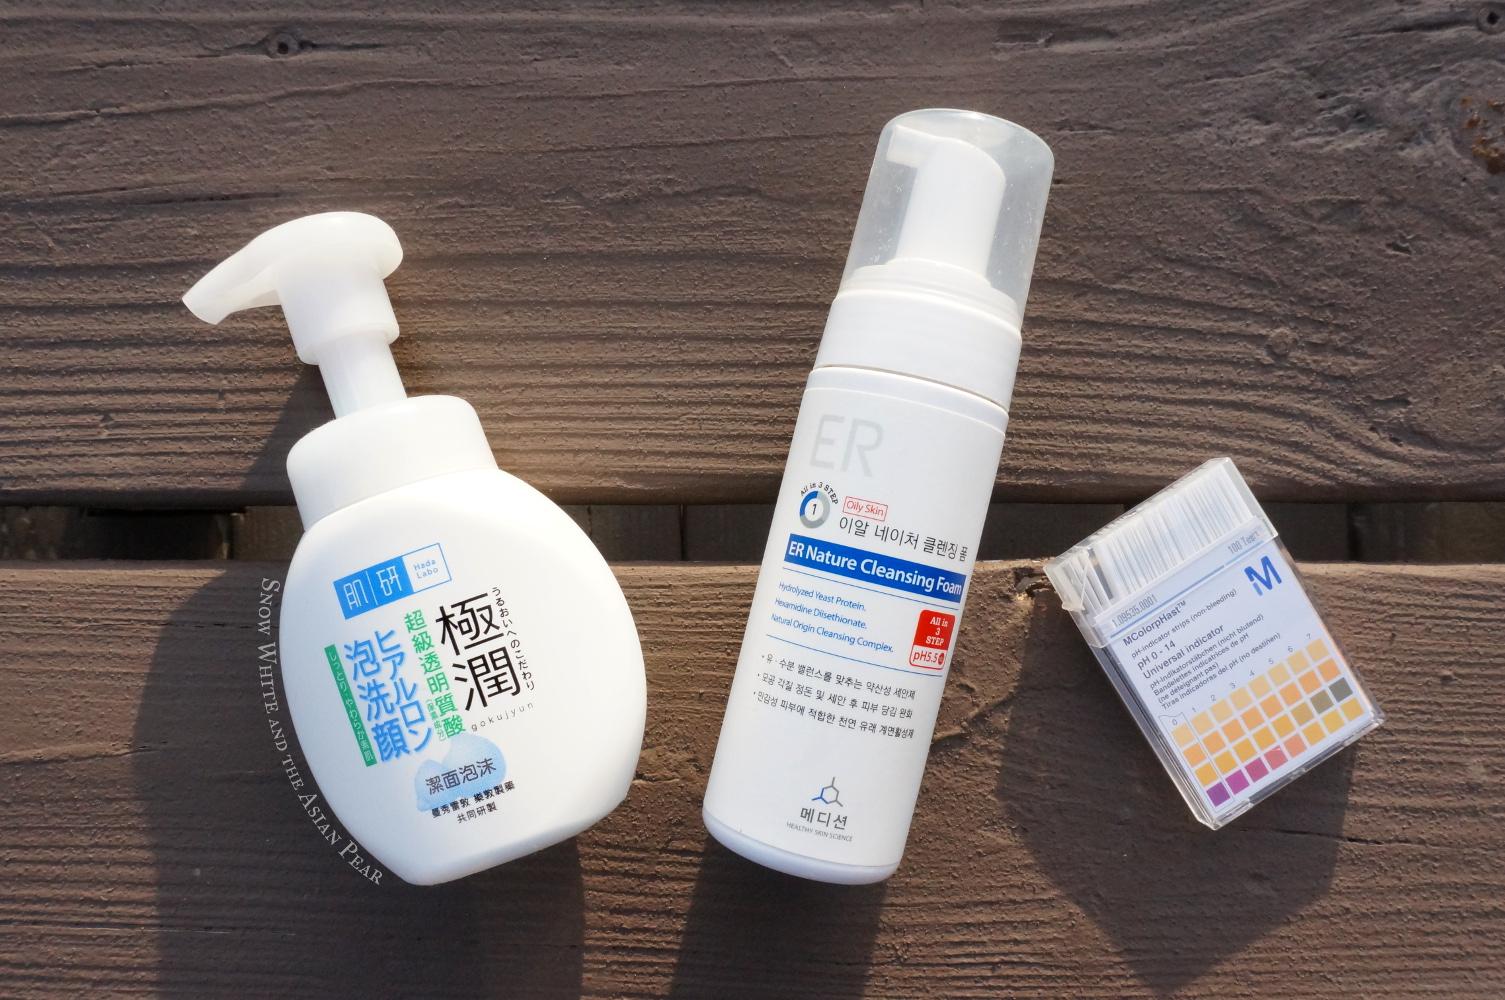 Hada Labo Rohto Gokujyn Hyaluronic Acid Cleansing Foam, 160ml Academie - Aromatherapie Treatment Oil - Hydrating - For All Skin Types -30ml/1oz